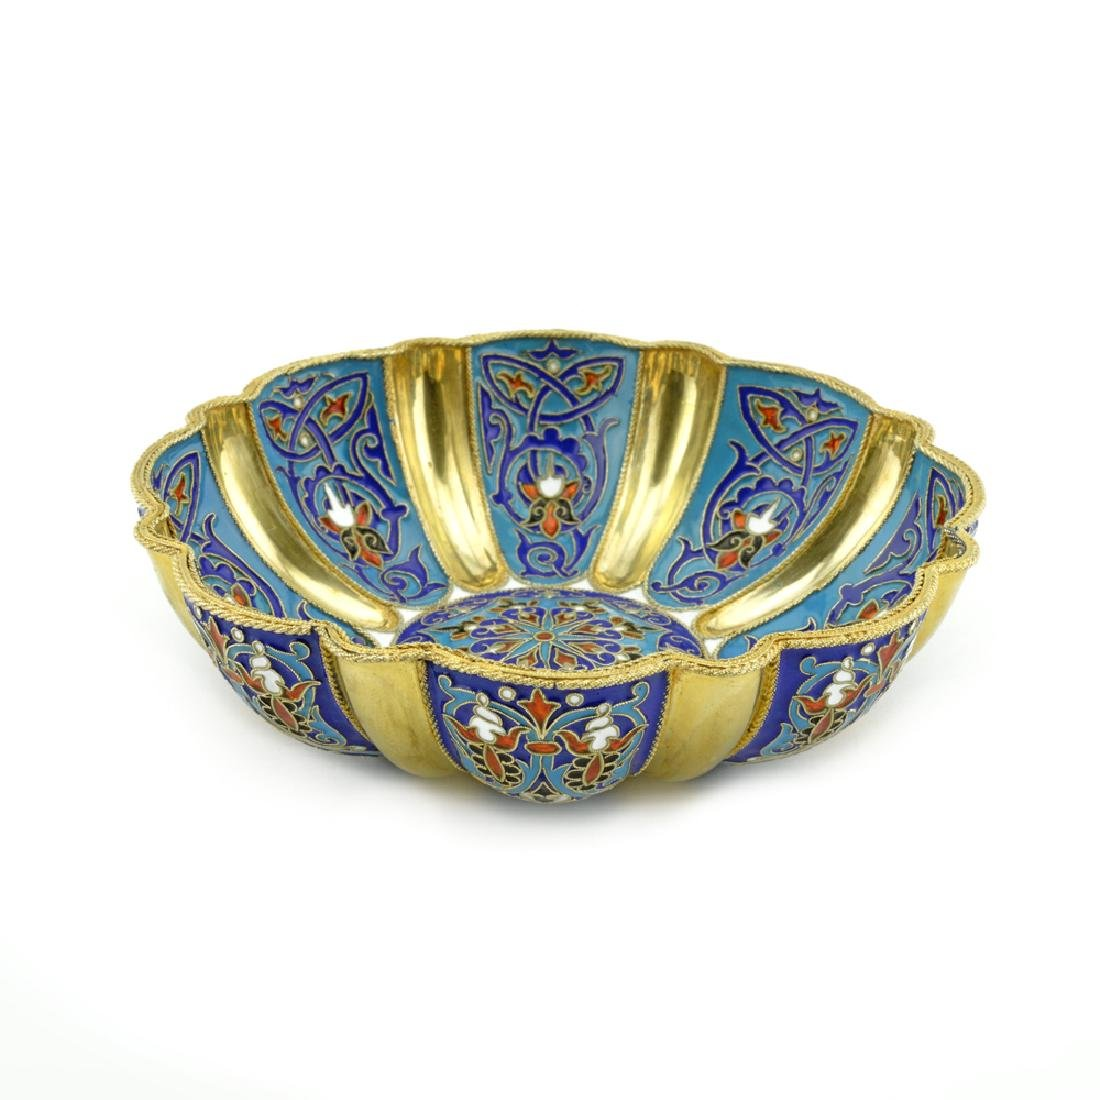 Khlebnikov cloisonne enamel bowl